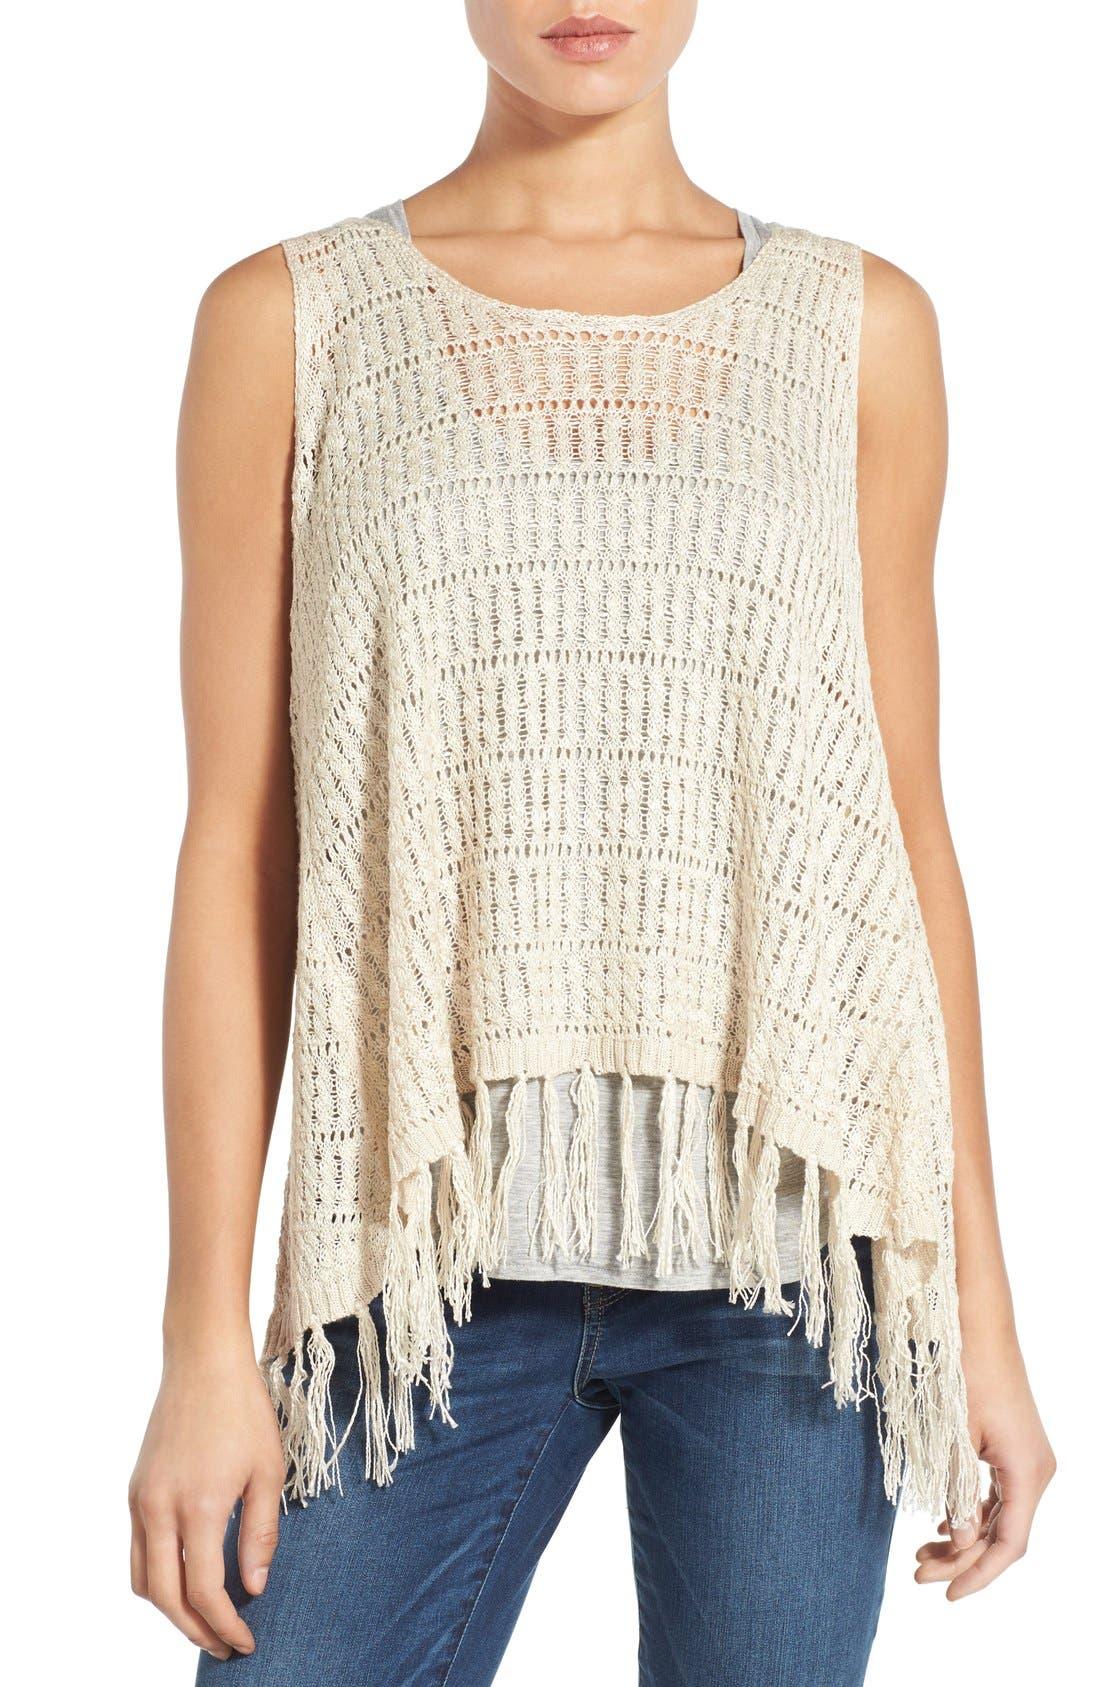 Alternate Image 1 Selected - Wit & Wisdom Fringed Split Back Open Weave Sweater (Nordstrom Exclusive)